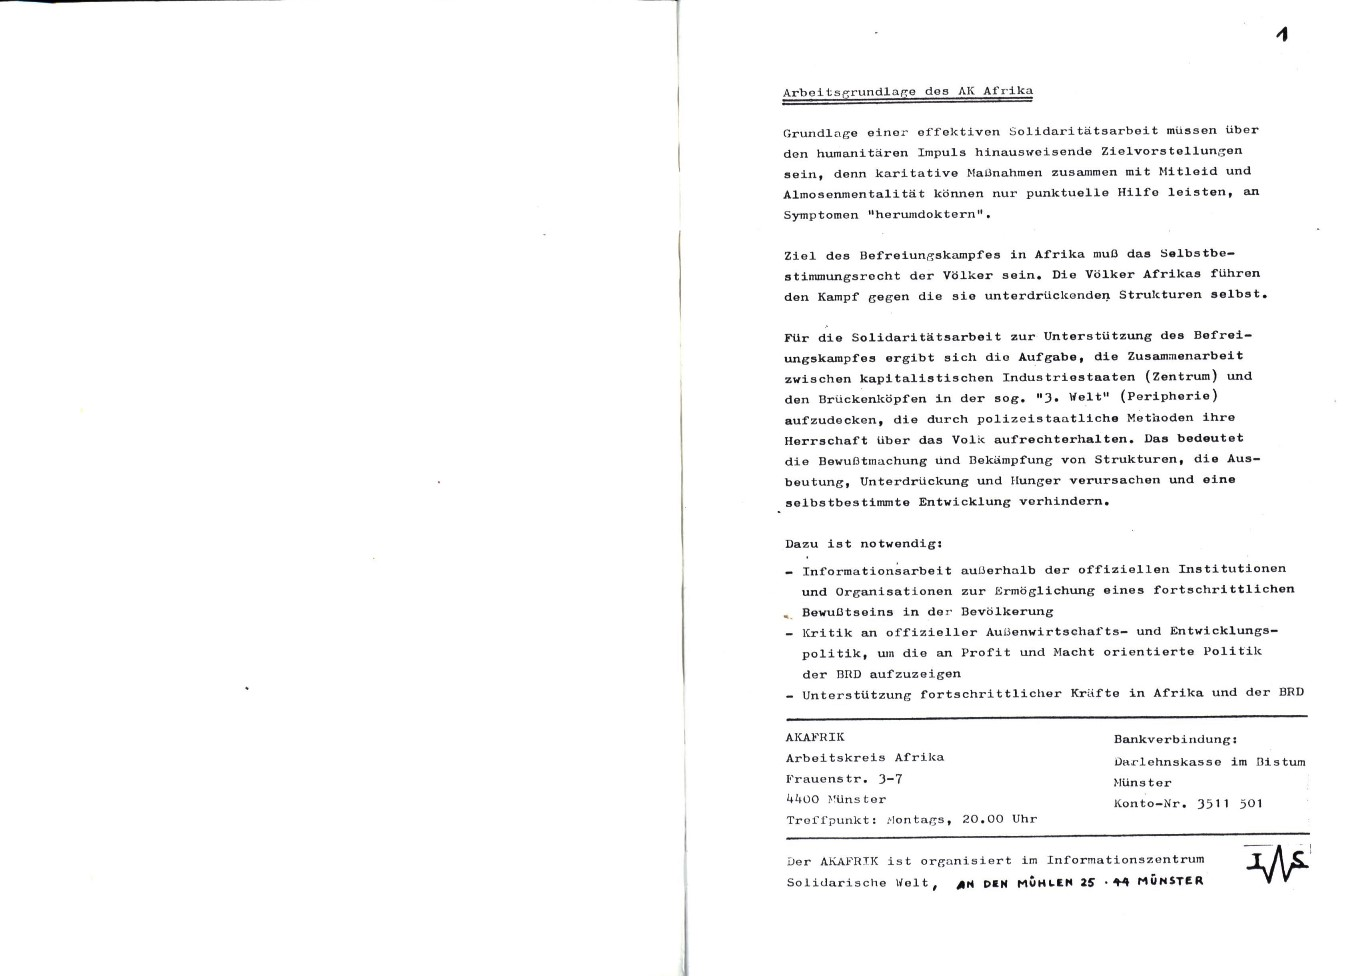 Muenster_AKAFRIK_1981_Suedafrika_BRD_02